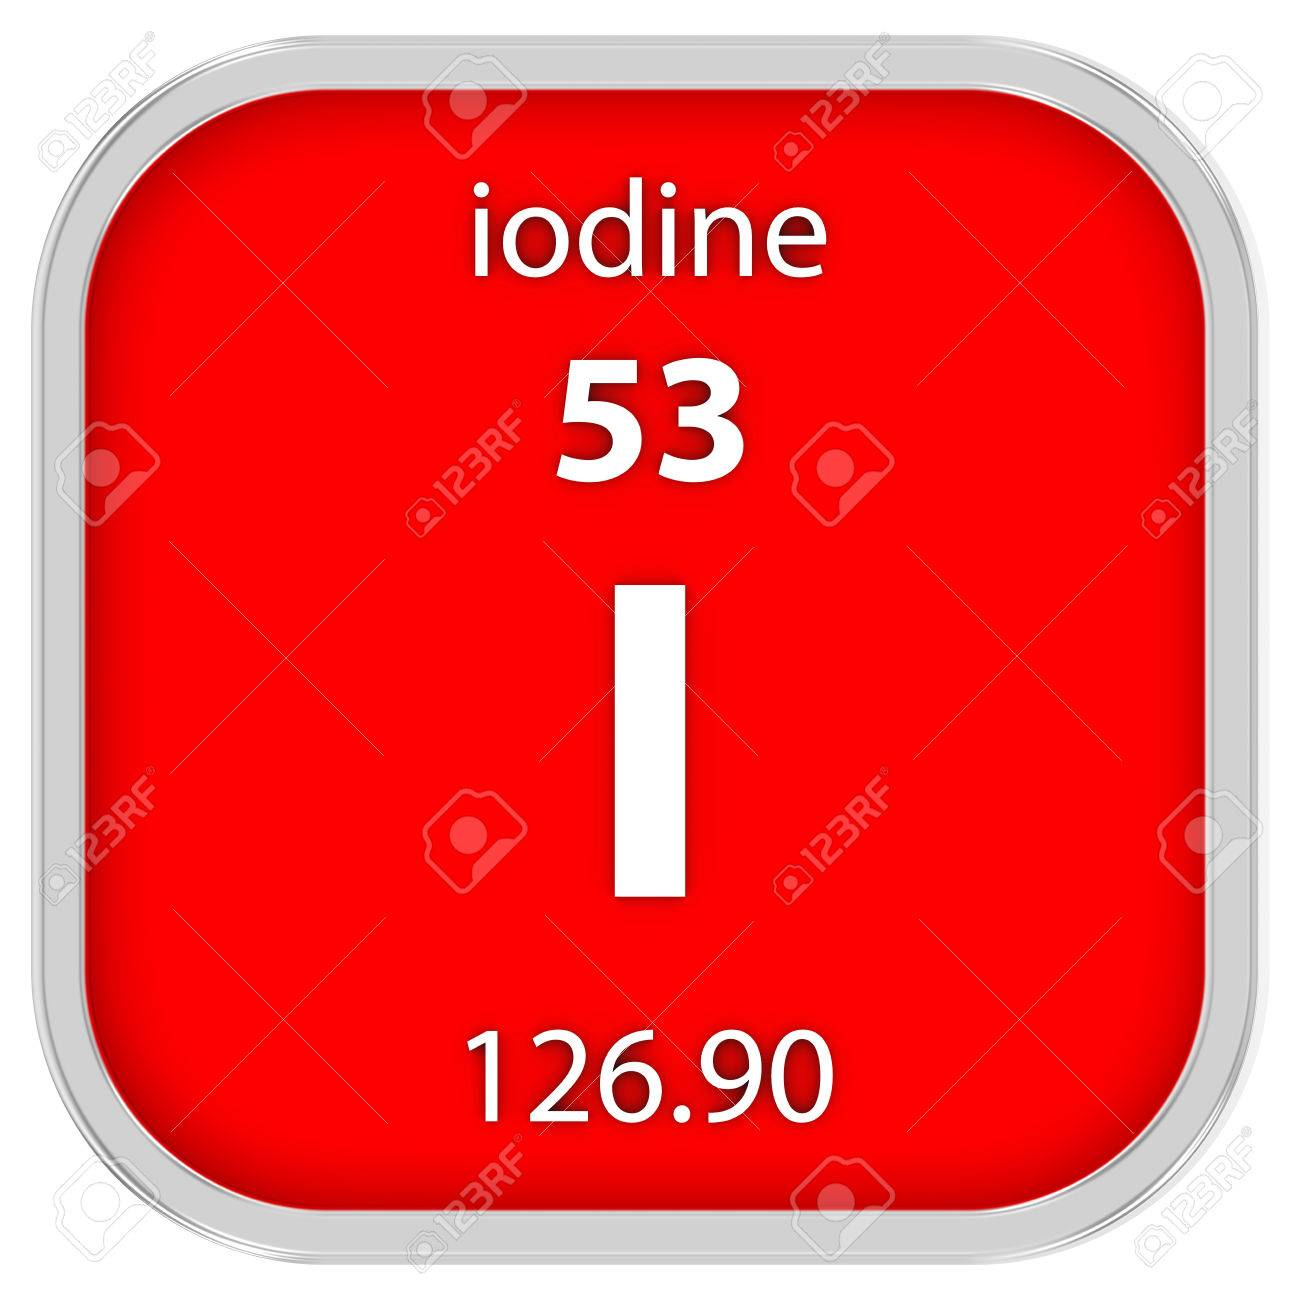 Iodine material on the periodic table stock photo picture and iodine material on the periodic table stock photo 41158598 urtaz Choice Image